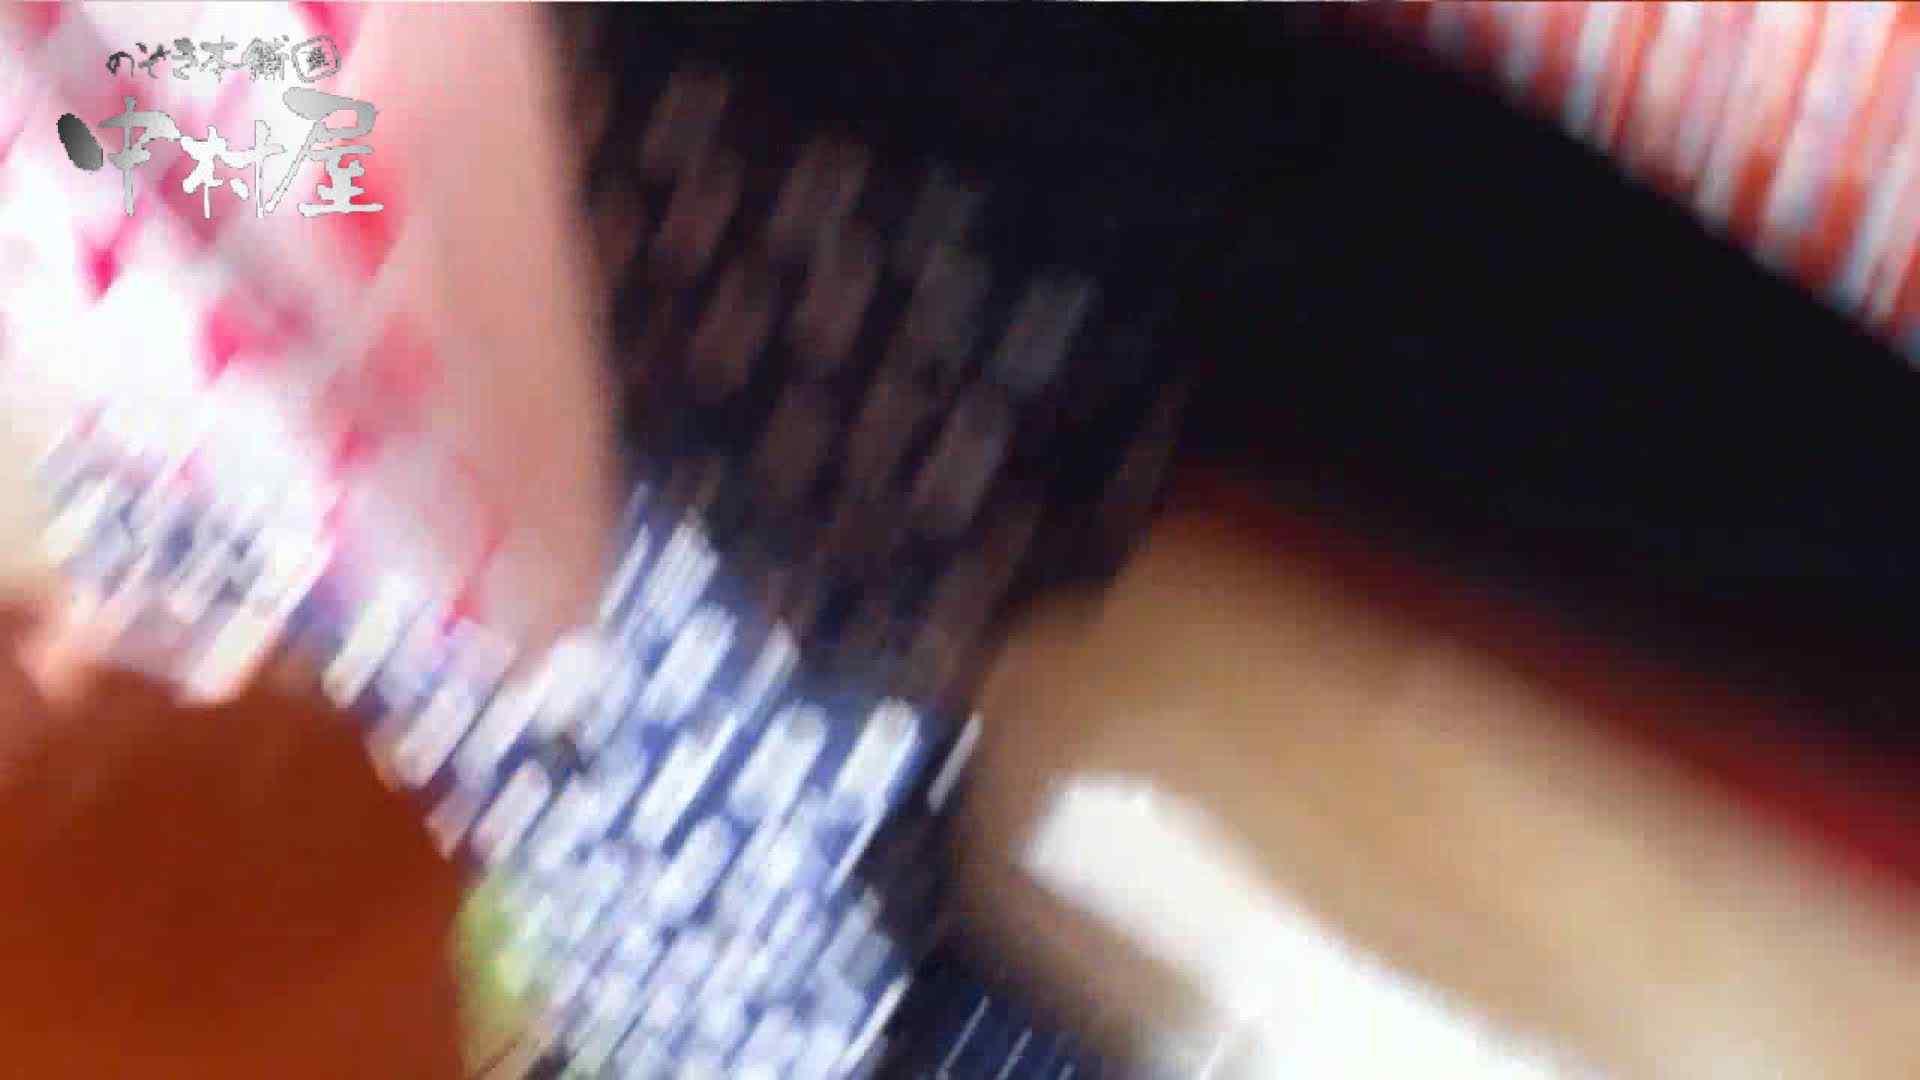 vol.52 美人アパレル胸チラ&パンチラ おとなしそうな店員の胸元にアタック! 美人  94Pix 43